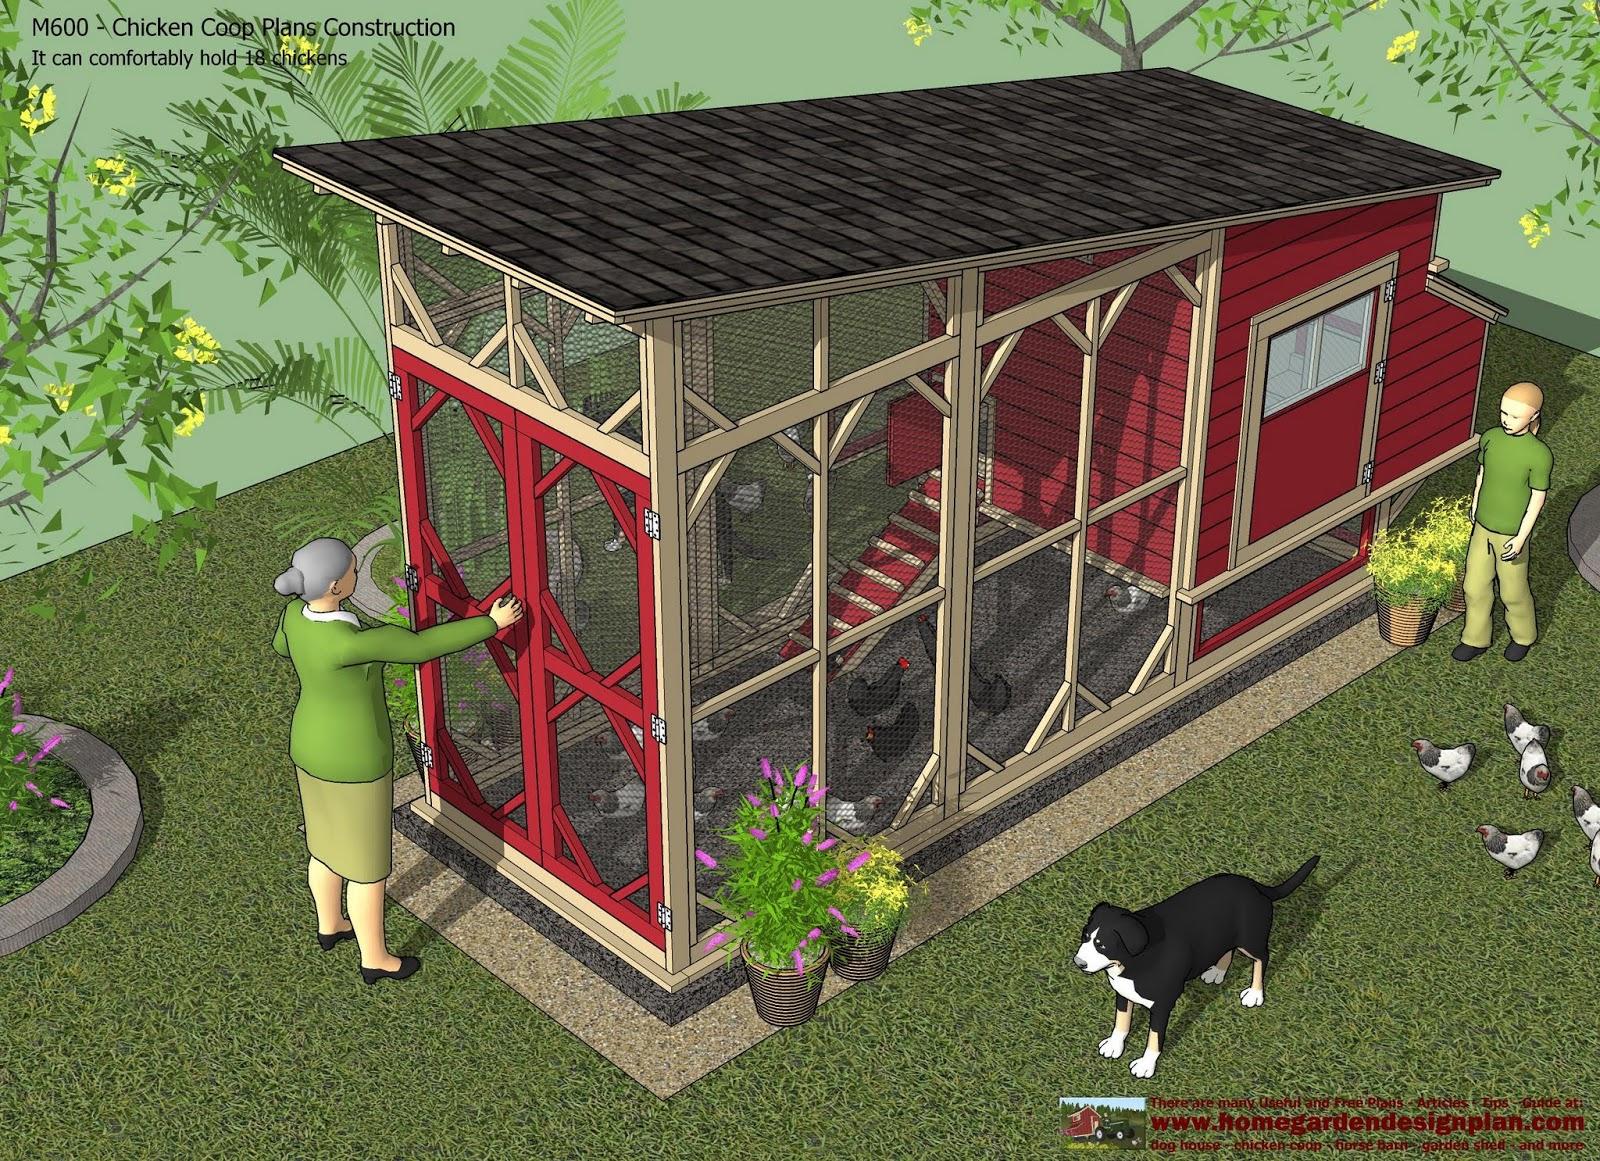 Home Garden Plans Free Plans